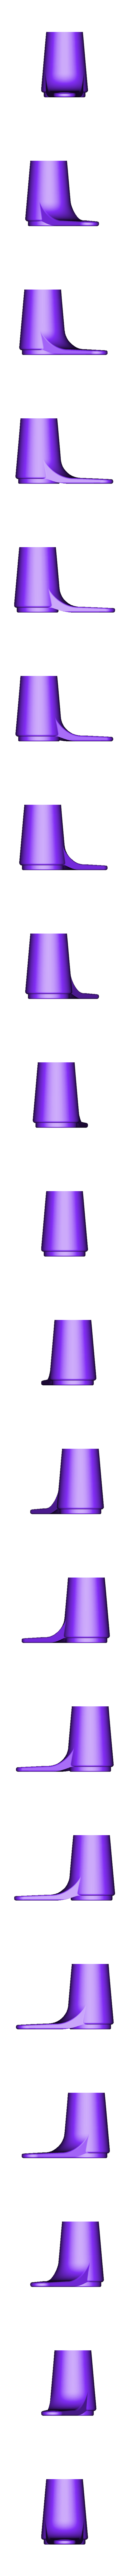 Kureg_coffee_measure_redesigned_v4.stl Download free STL file Keurig K-cup scoop • 3D print object, Jadkison60